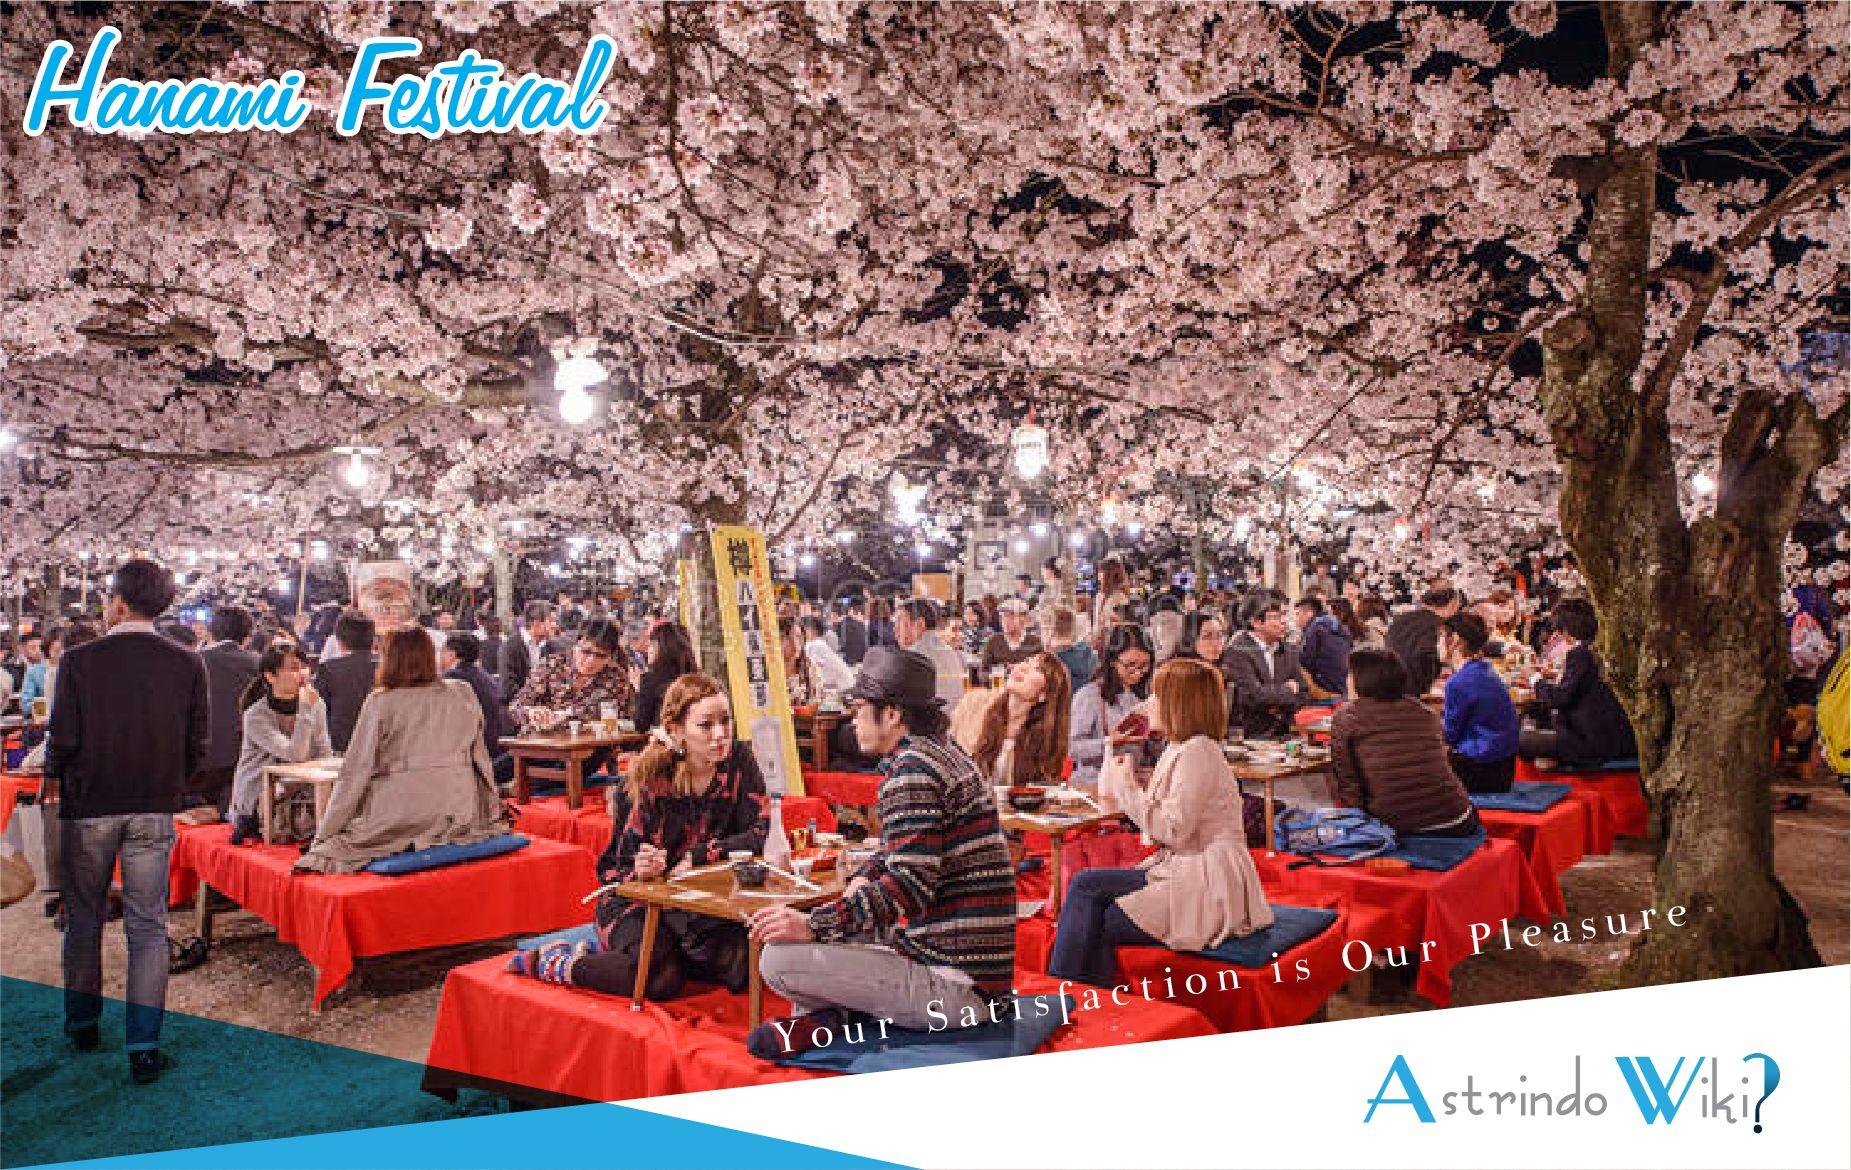 Astrindowiki Astrindotravelservices Promotiket Tiketmurah Pakettour Travel Travelindonesia Liburan Holiday Dreamdestination Hanami Japan Visit Japan